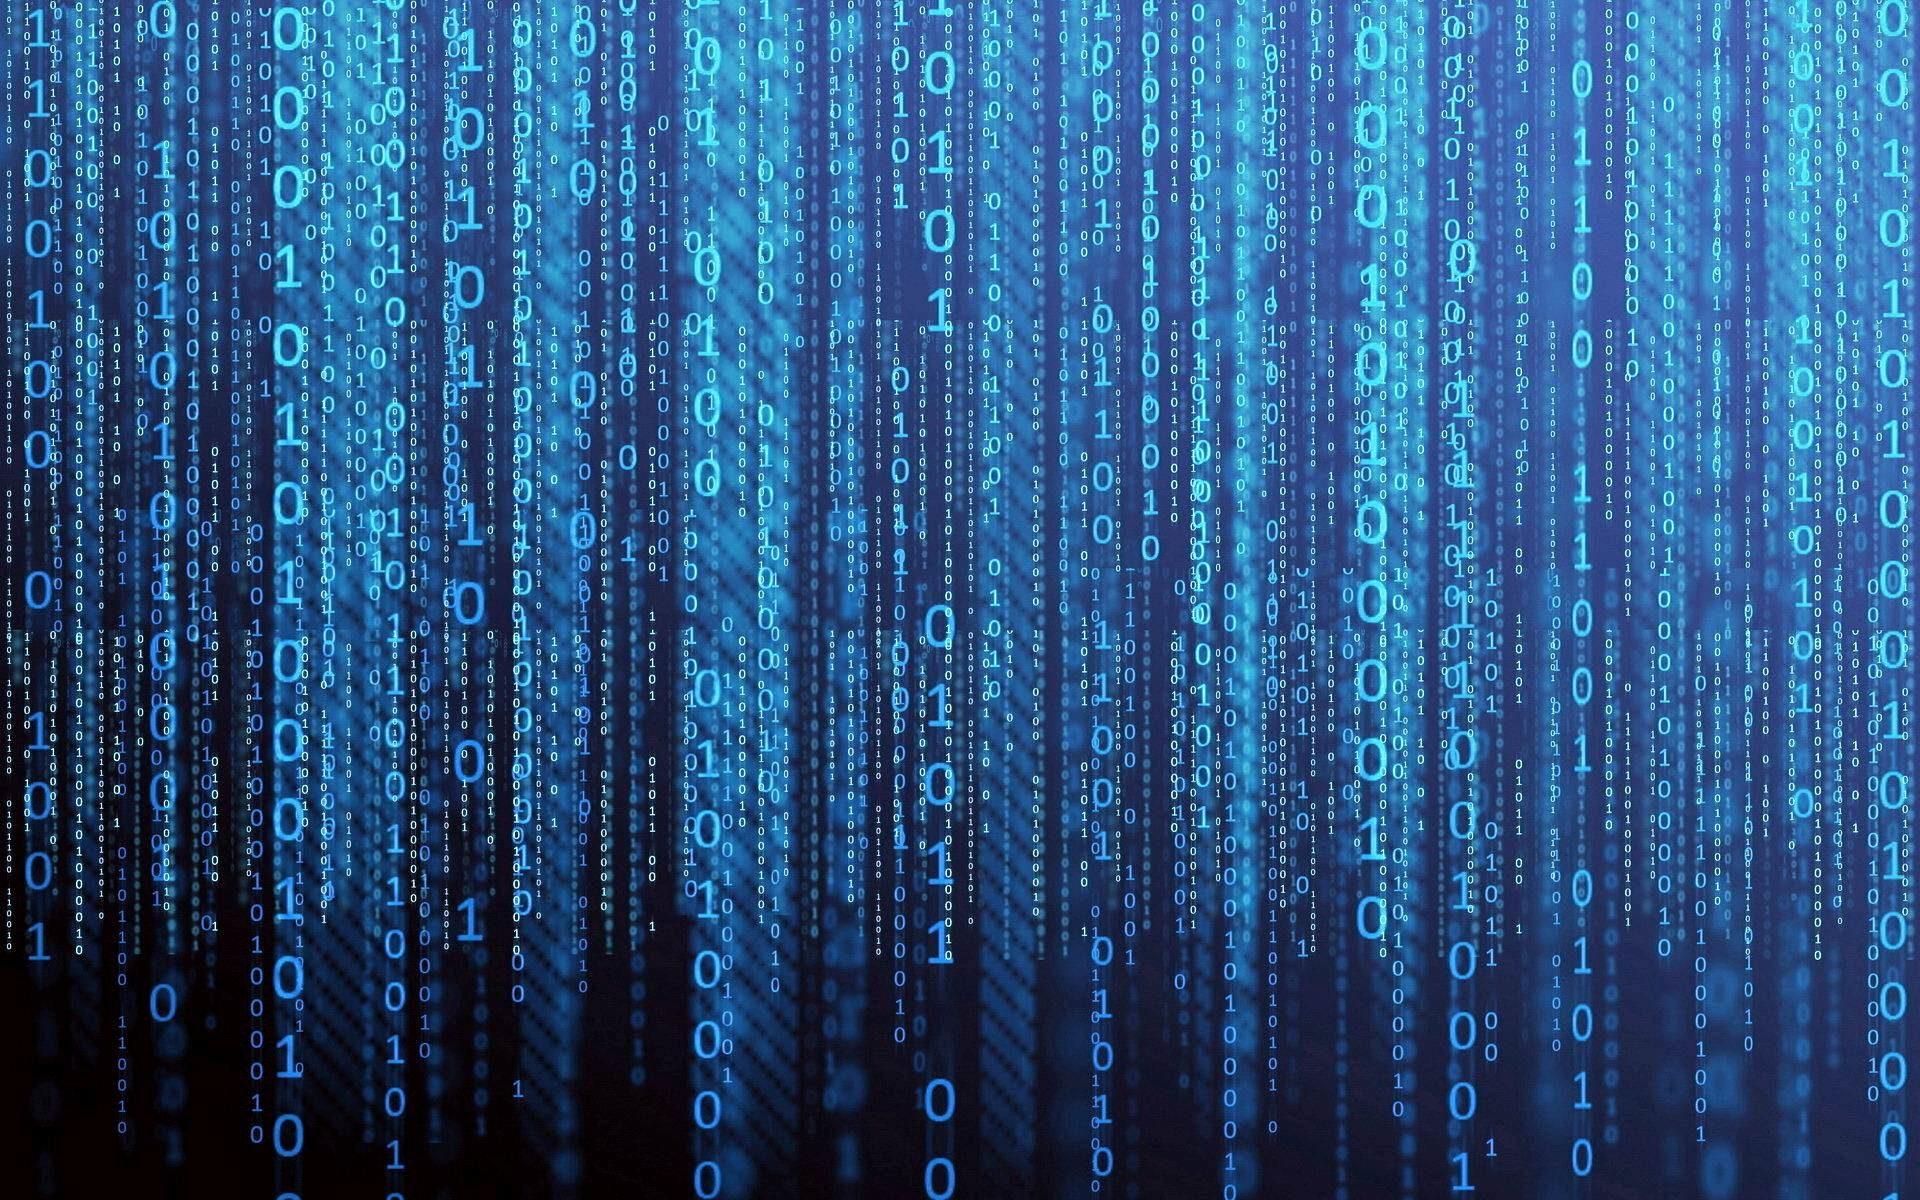 Matrix - la matrice